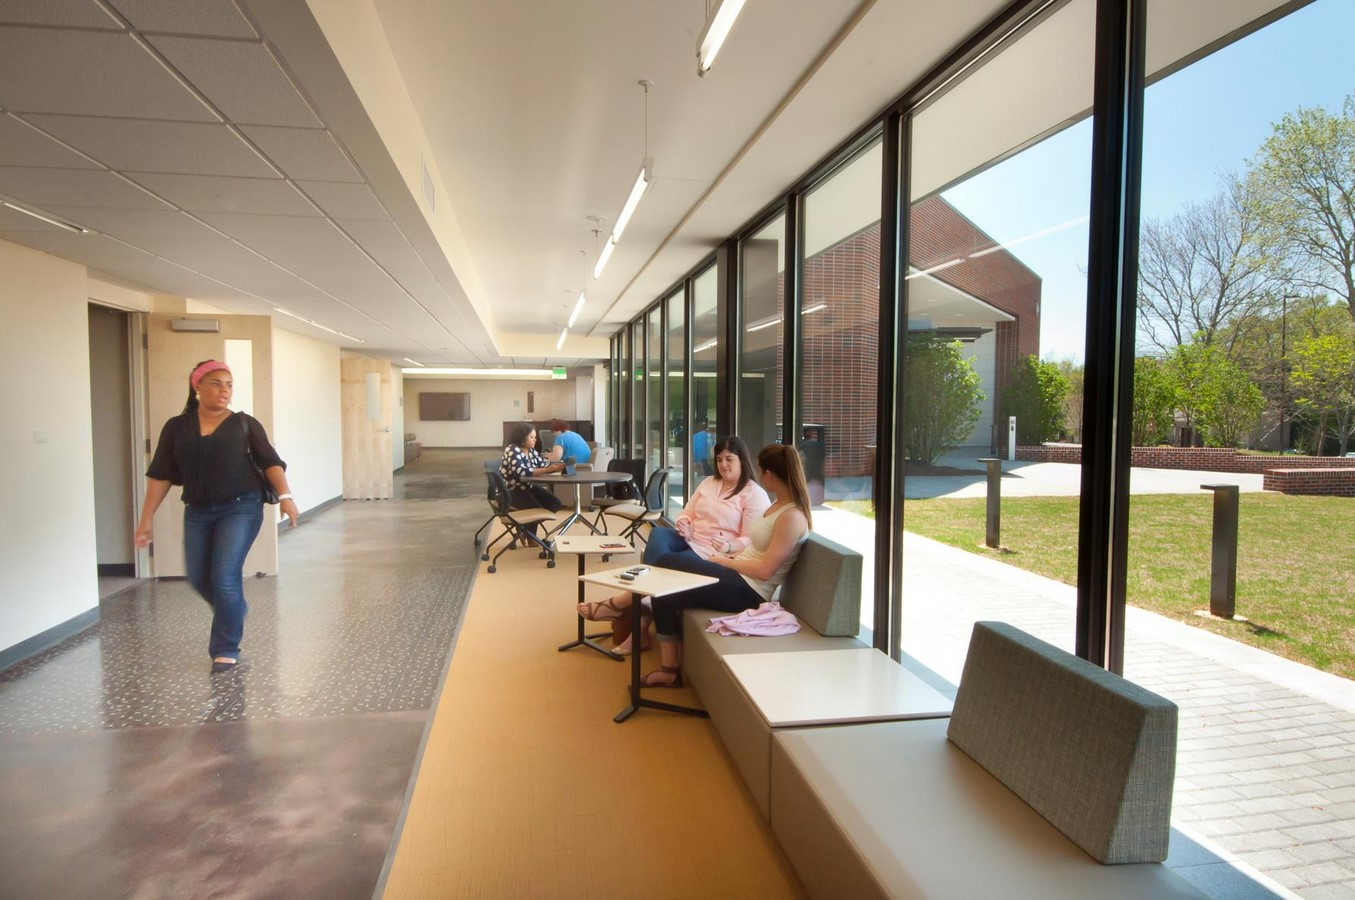 Newnan hospital renovation for the University of West Georgia - Sheet4